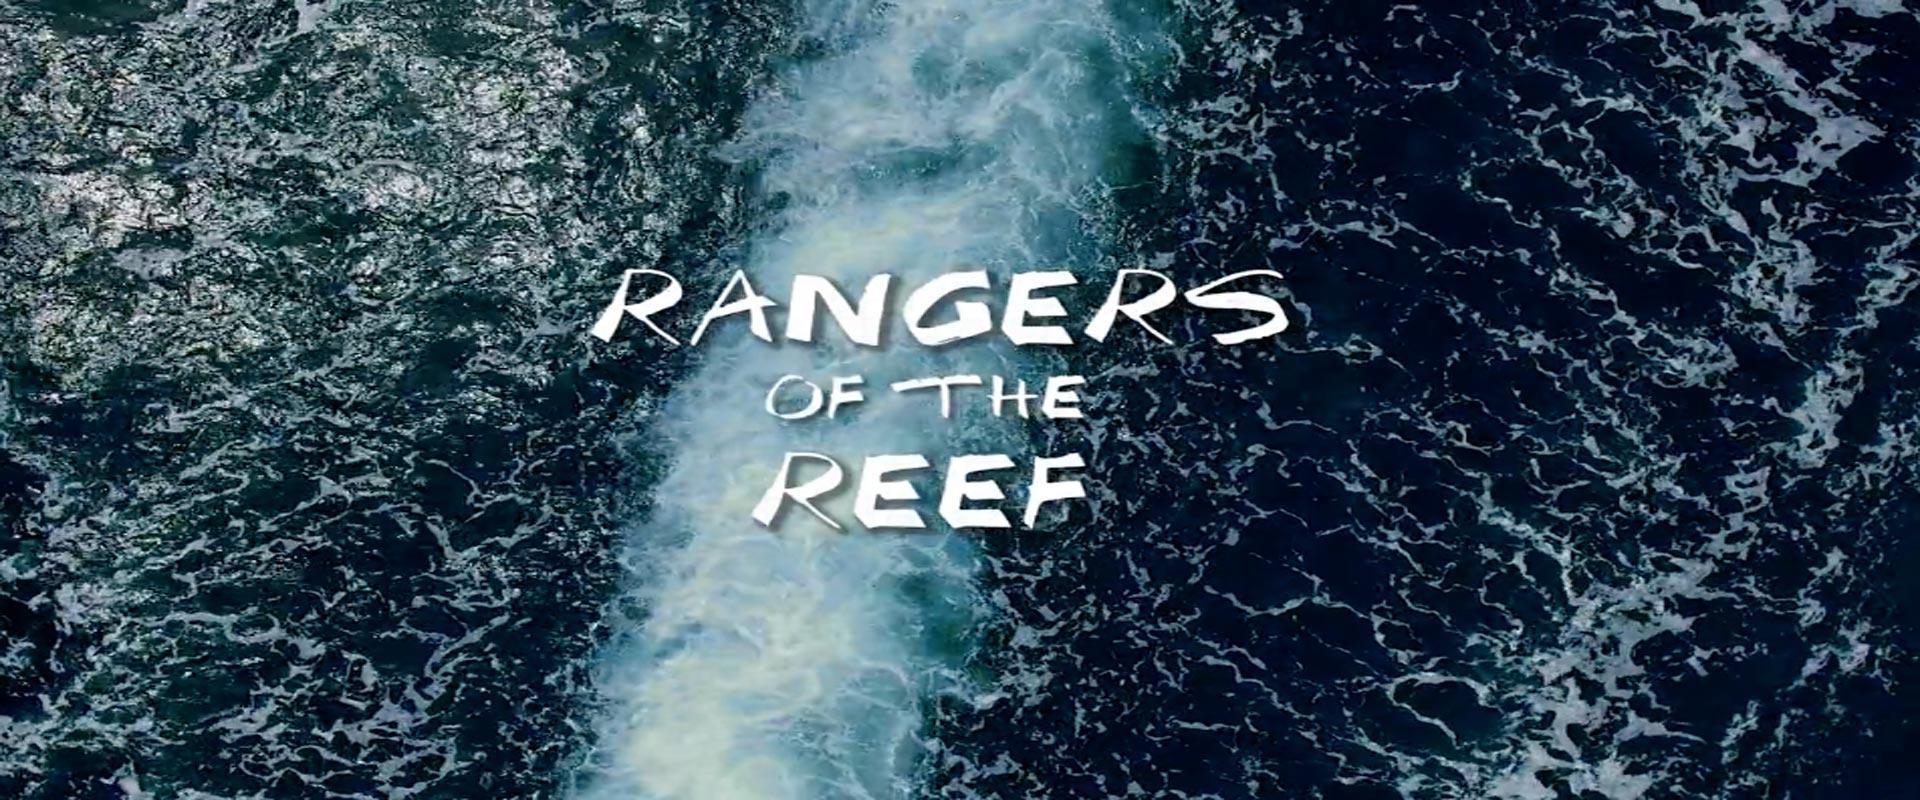 Rangers-of-the-Reef-header